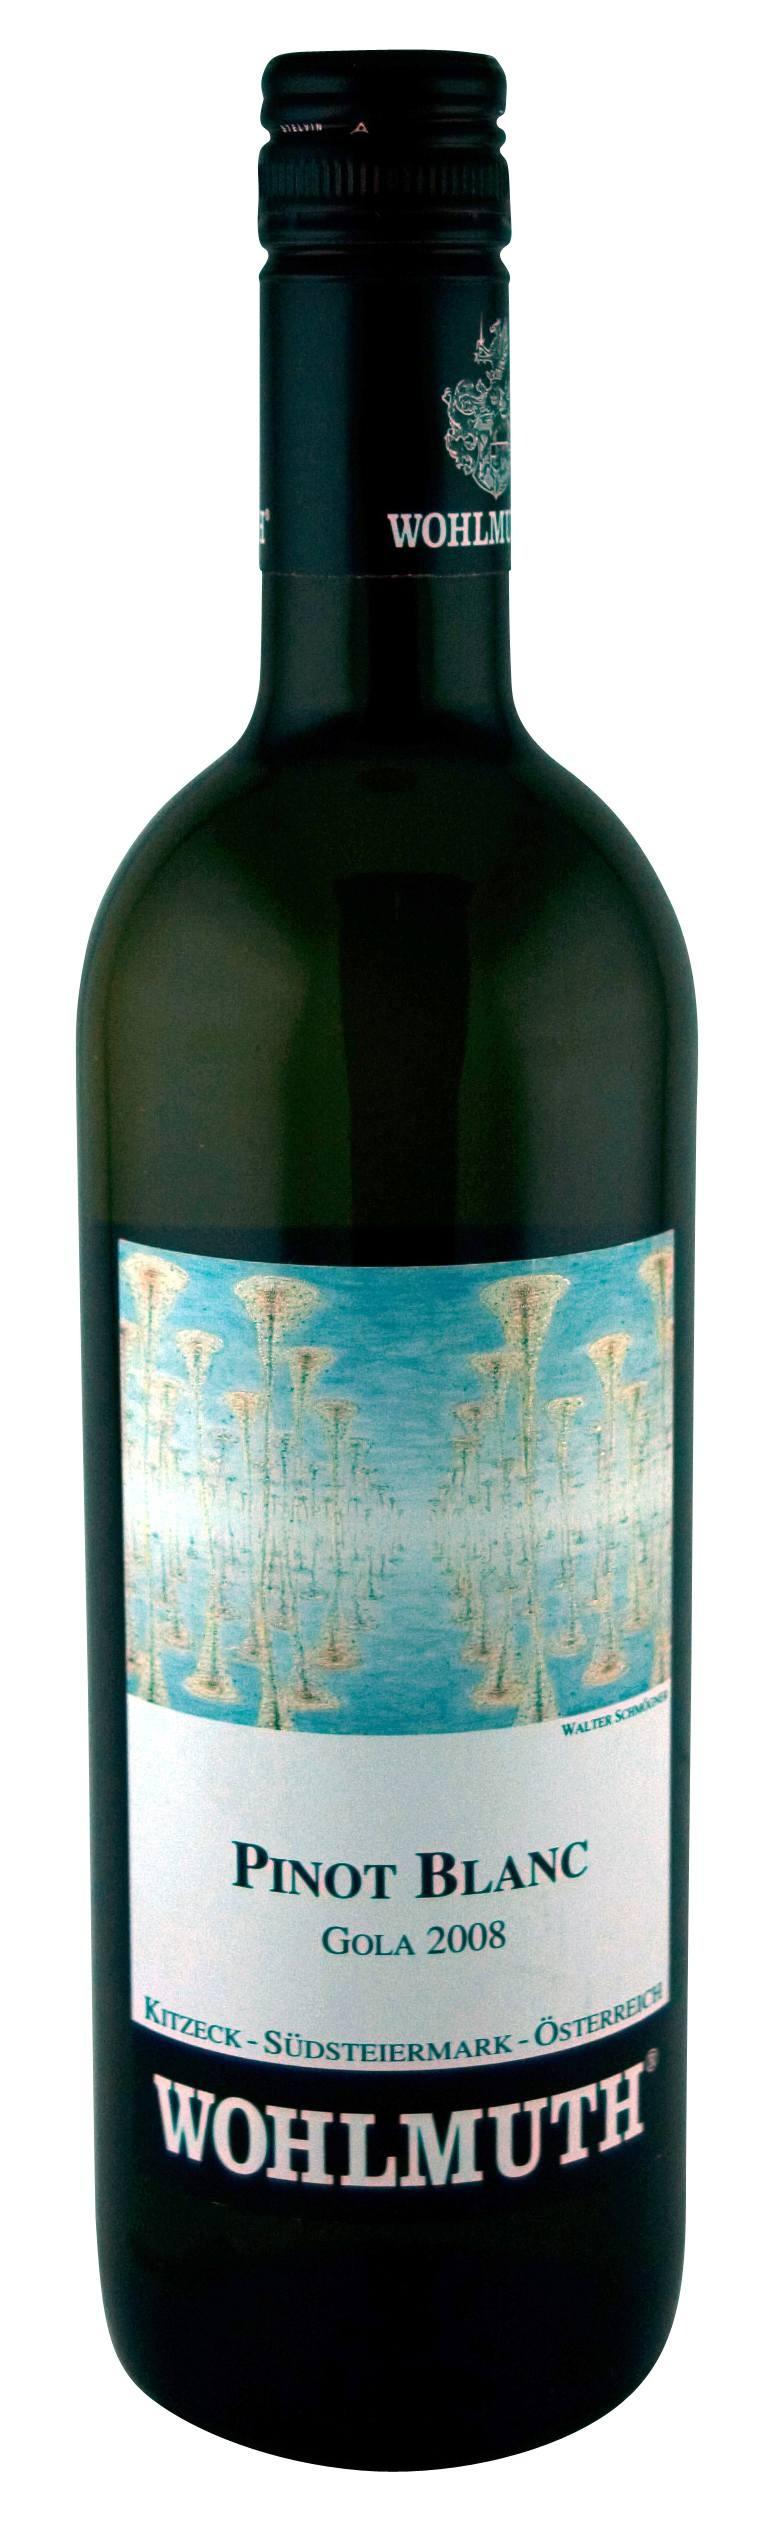 Wohlmuth - Pinot Blanc Gola, 2015